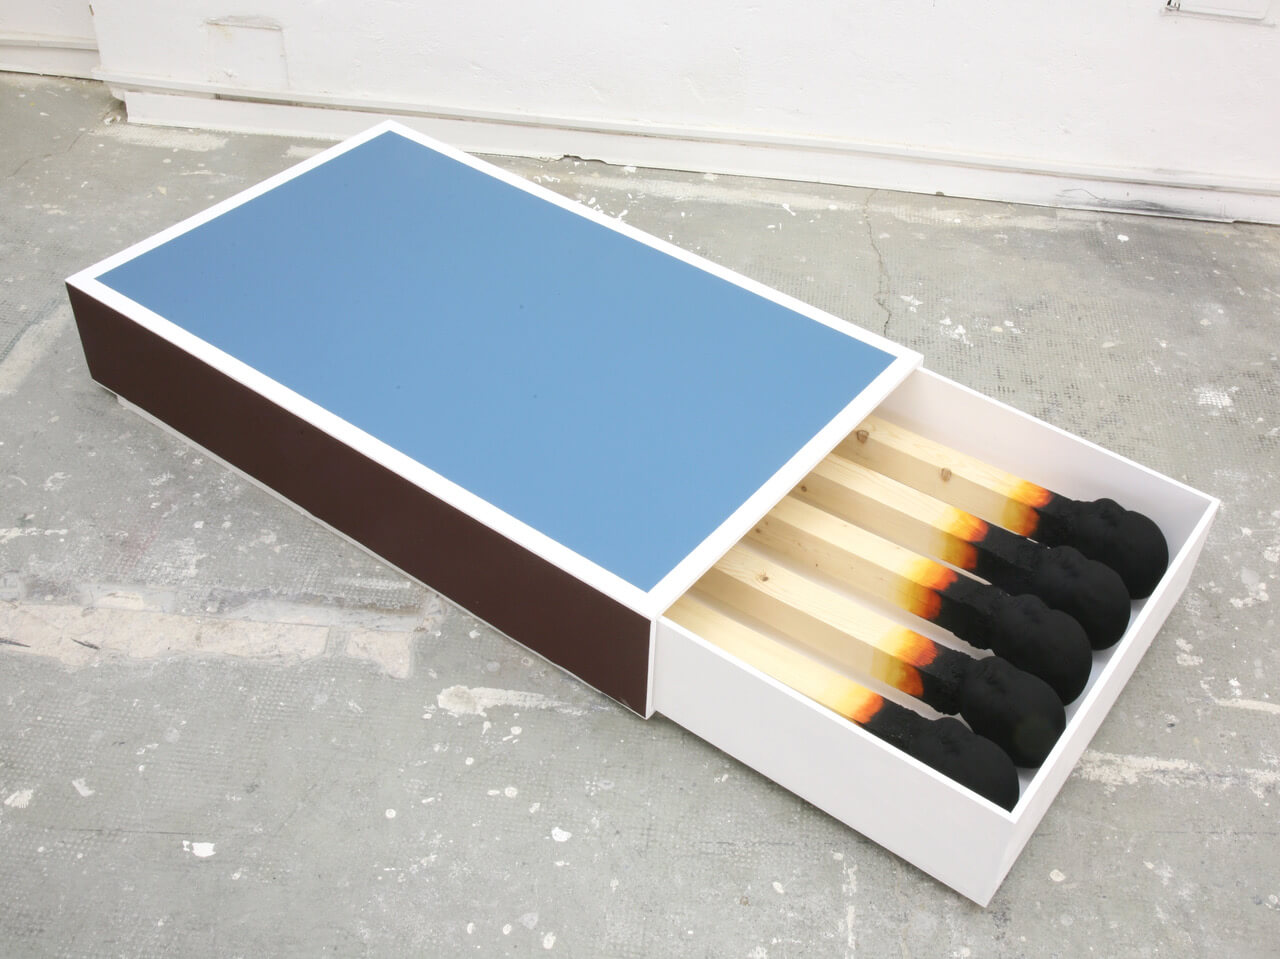 Galerie Benjamin Eck München wood, poyurethane, paint